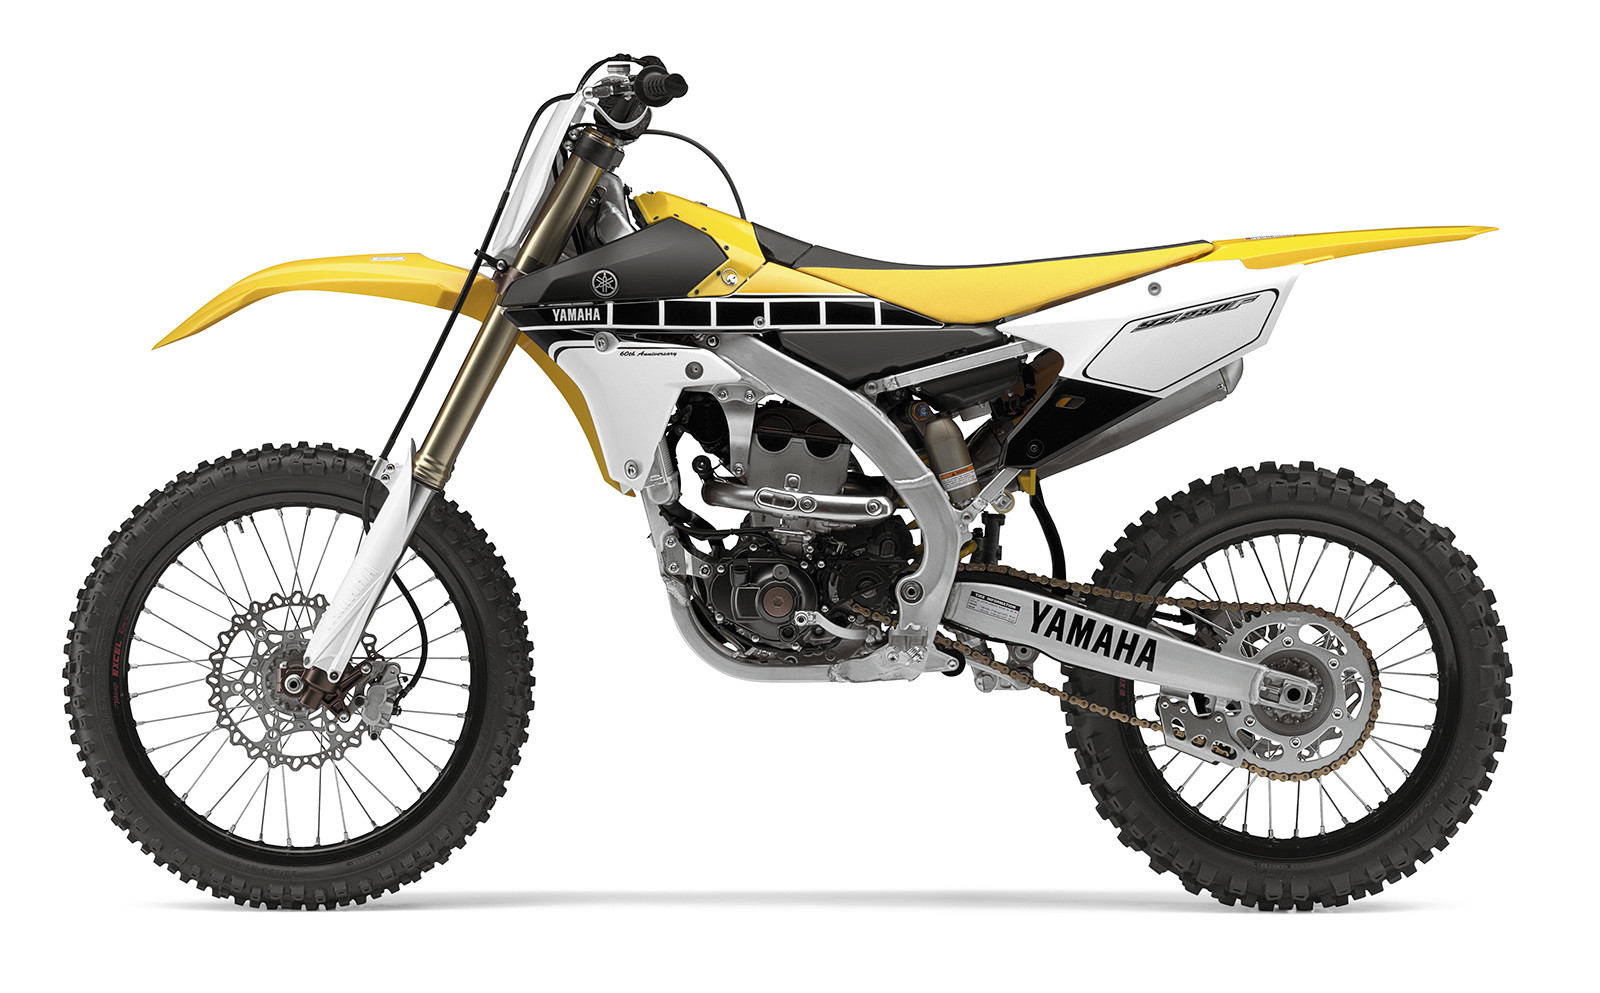 Yamaha Jgr Bike Engine